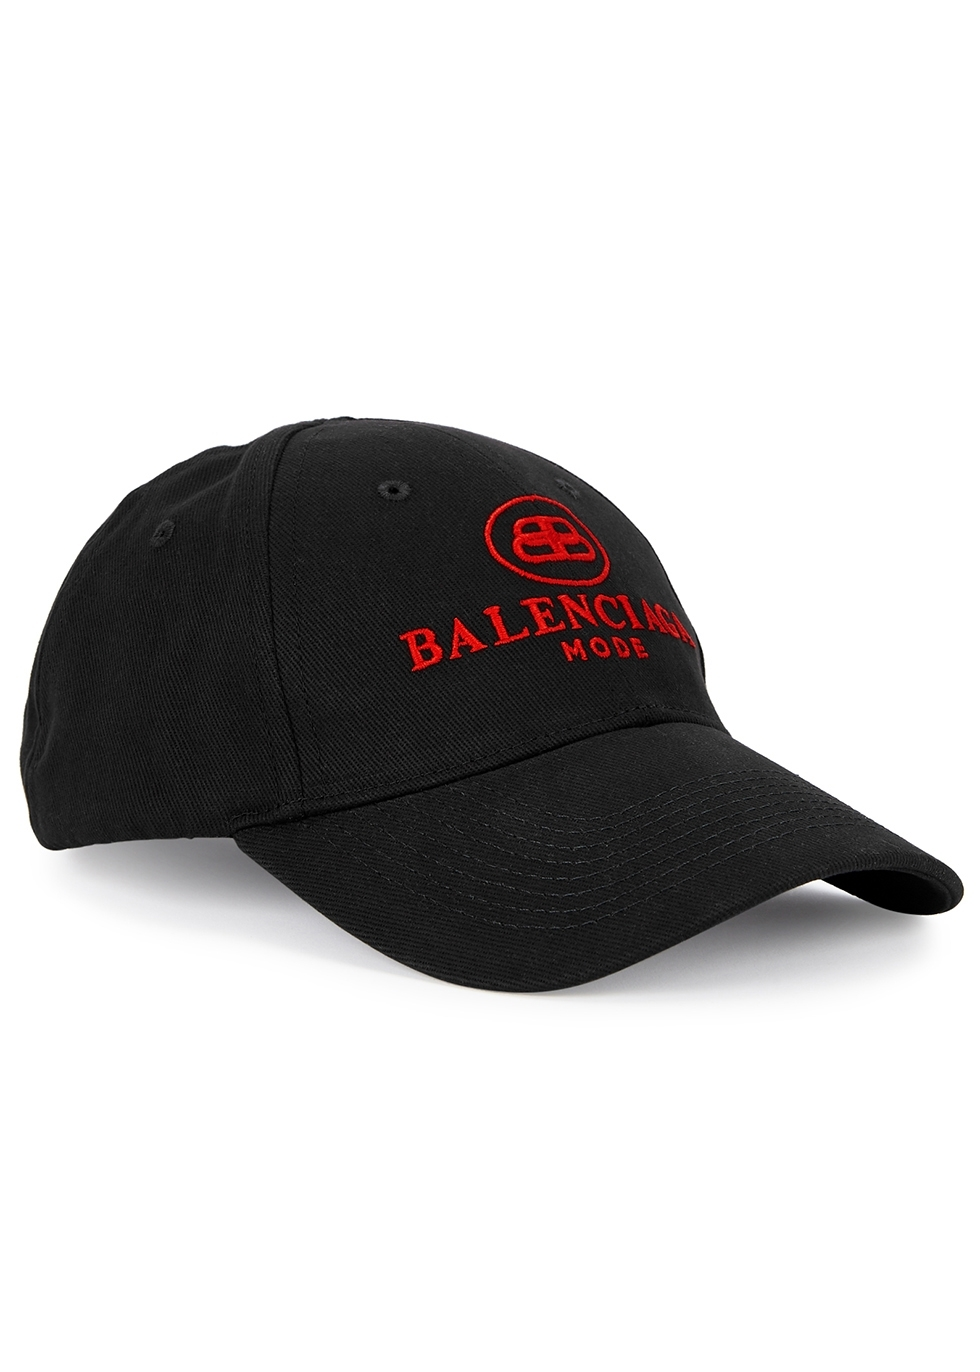 4b9c83e4 Men's Designer Hats - Harvey Nichols